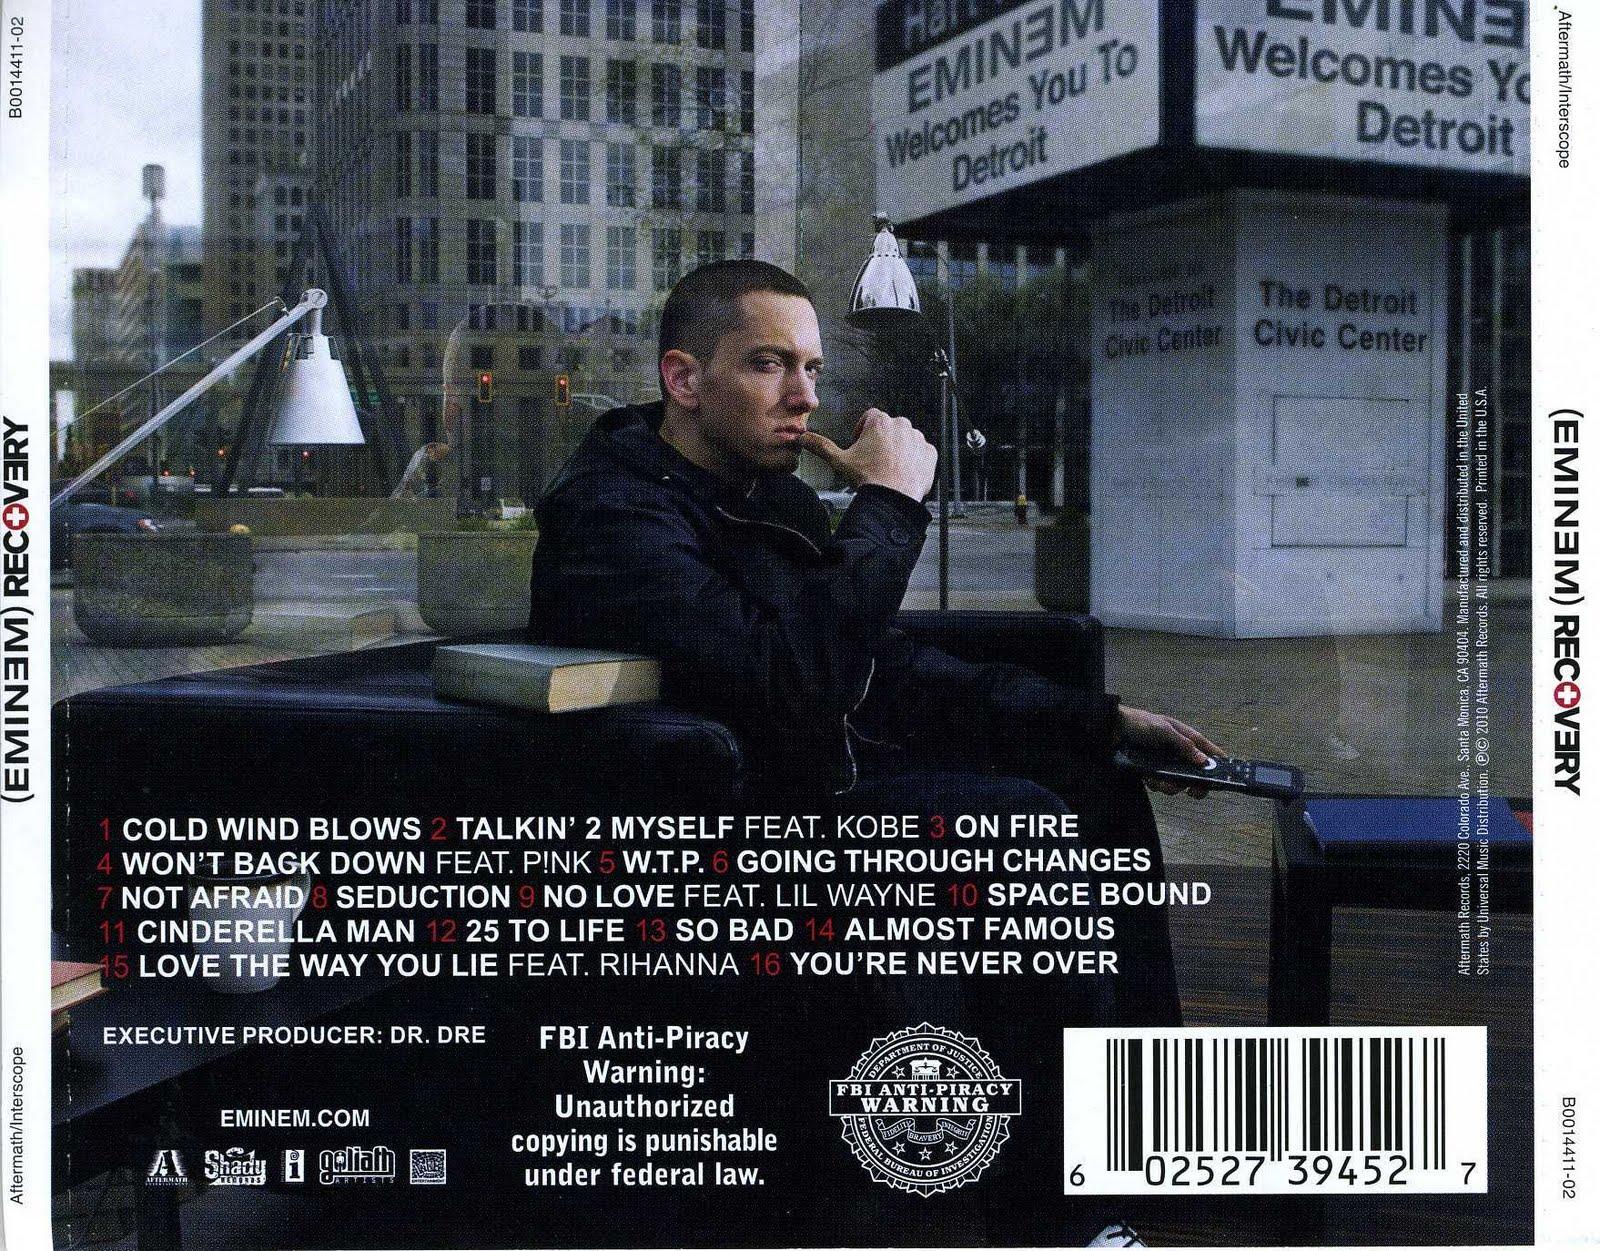 george music video blog album cover analysis